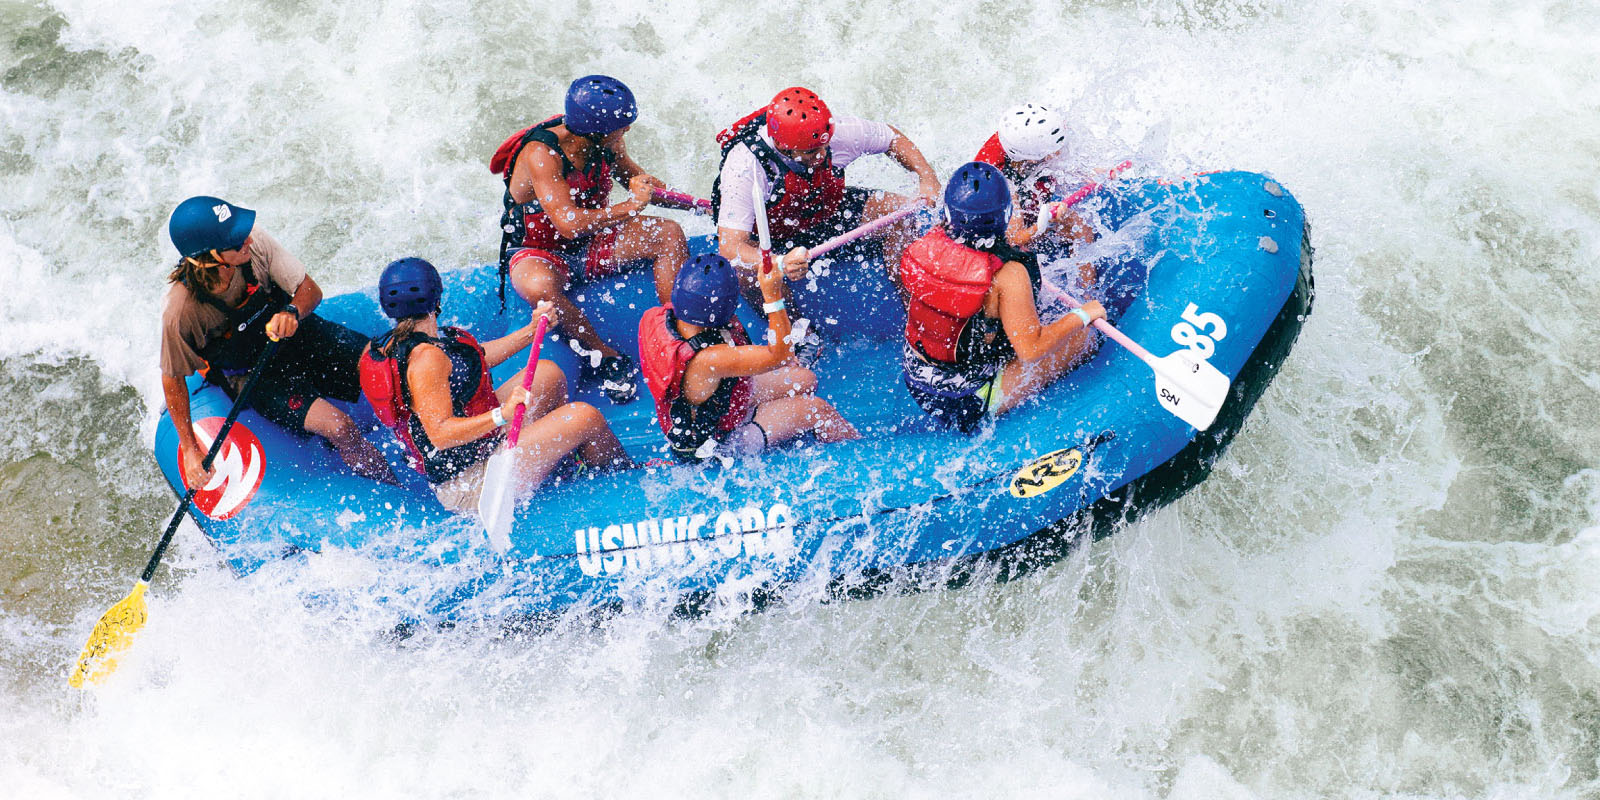 Ride the rapids.